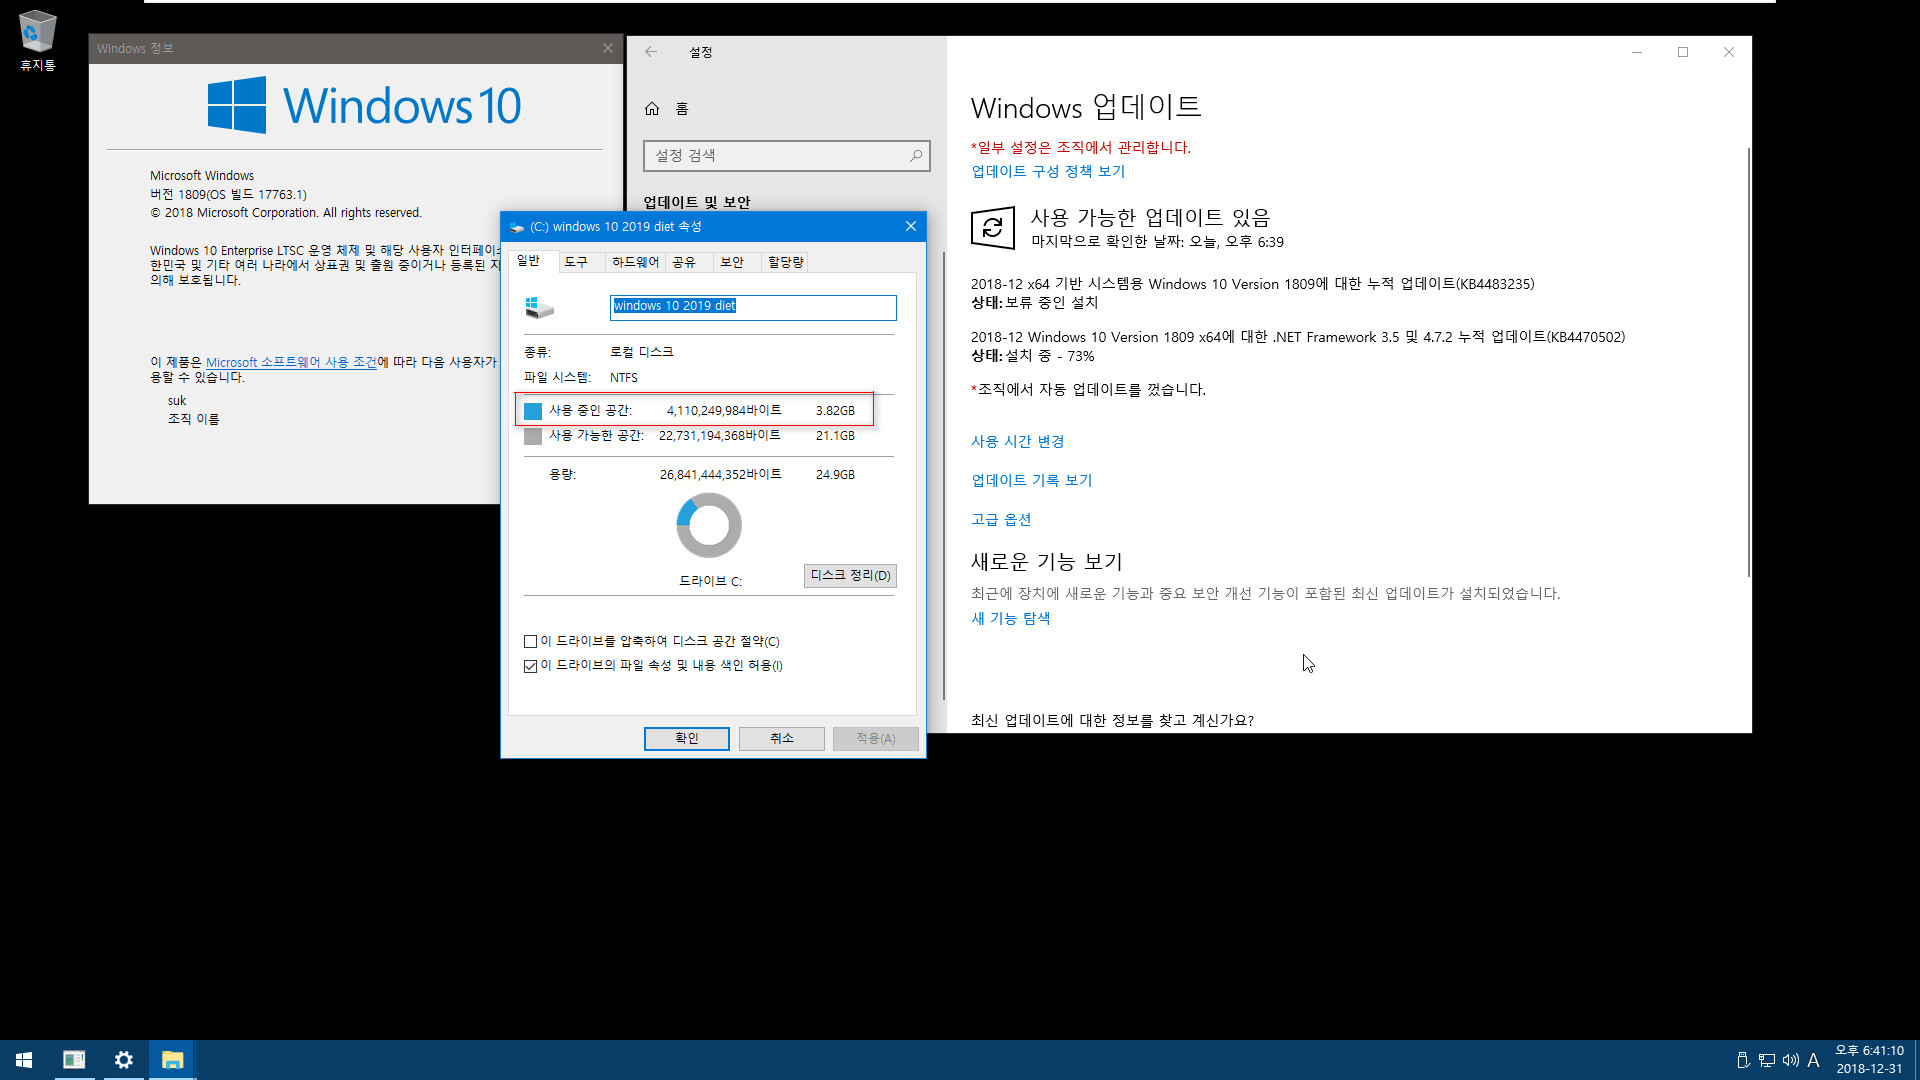 windows 10 2019 다이어트판.iso [2019 LTSC 64비트] - vhd 만들어서 vmware에 연결하여 부팅하기 2018-12-31_184110.jpg